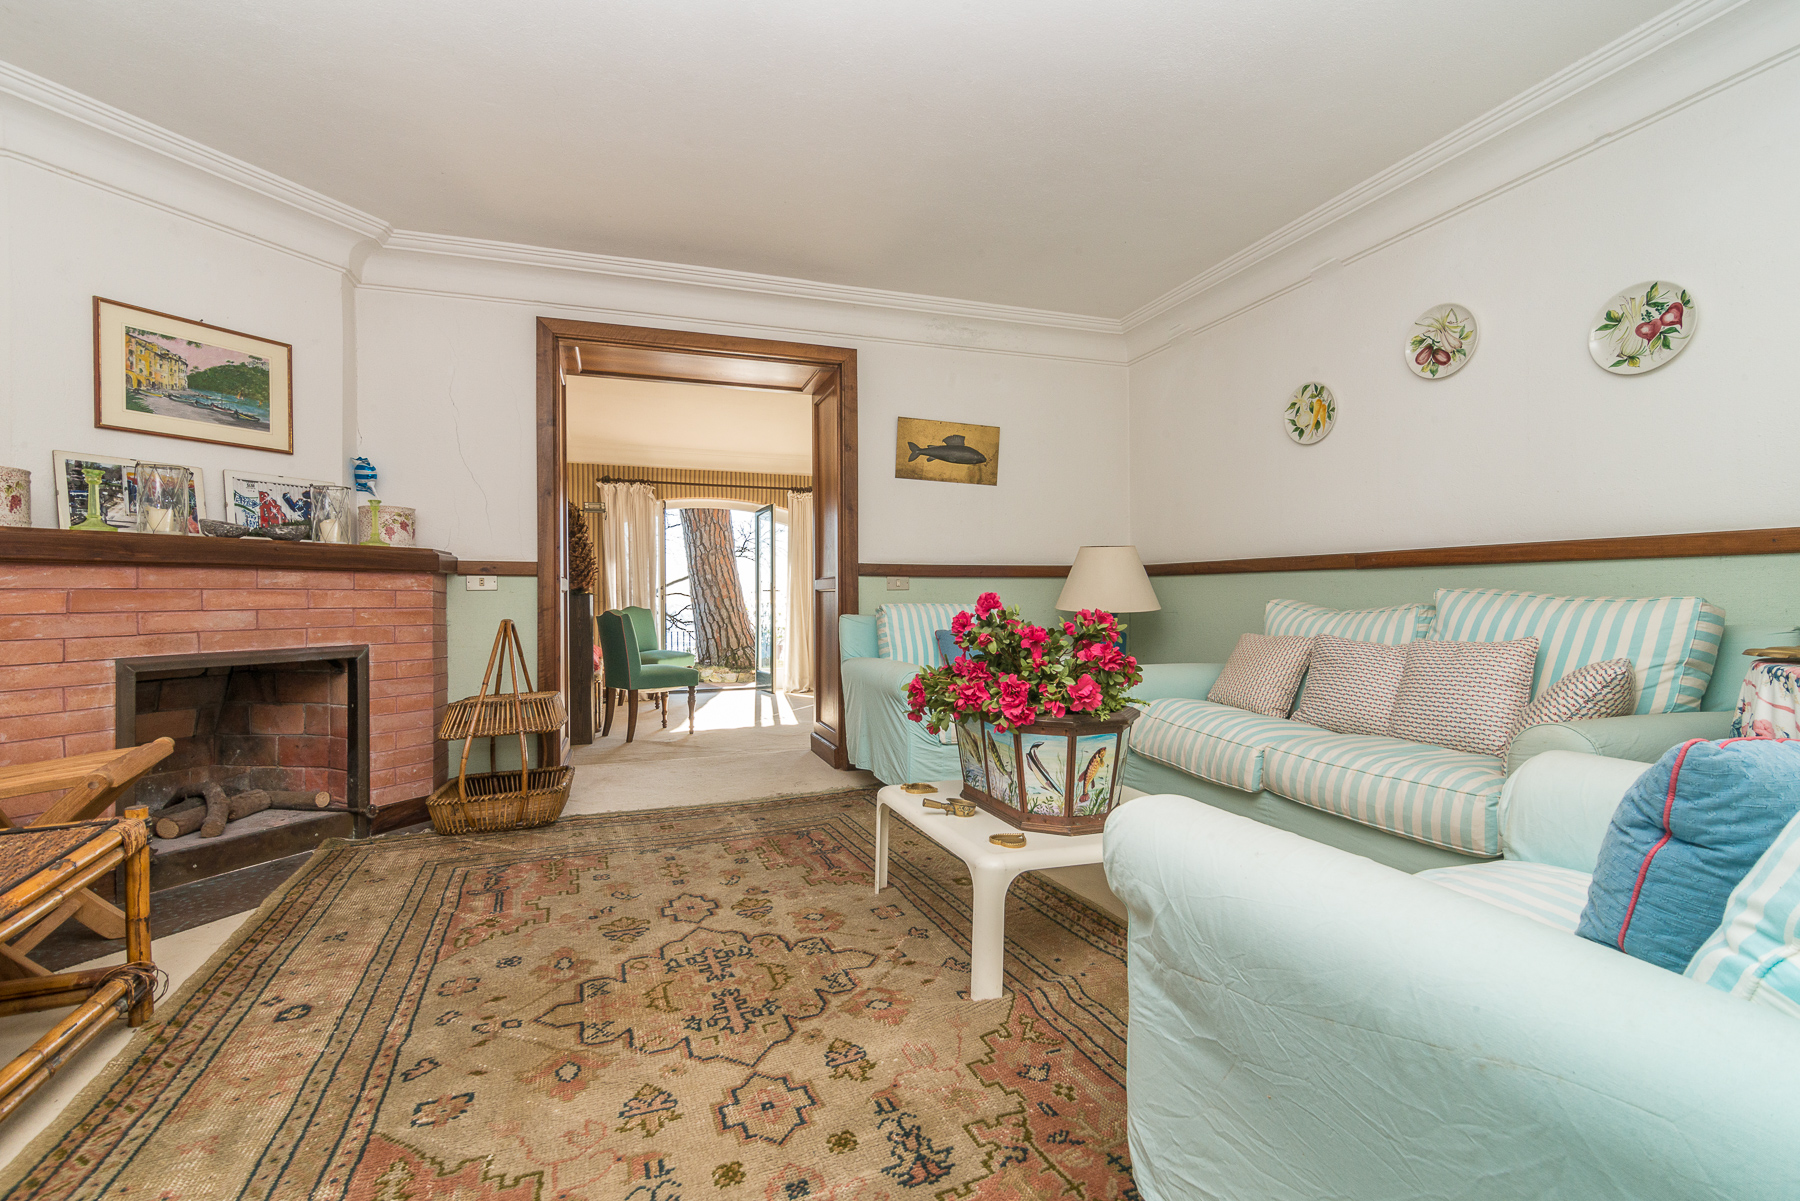 Villa in Vendita a Santa Margherita Ligure: 5 locali, 440 mq - Foto 27